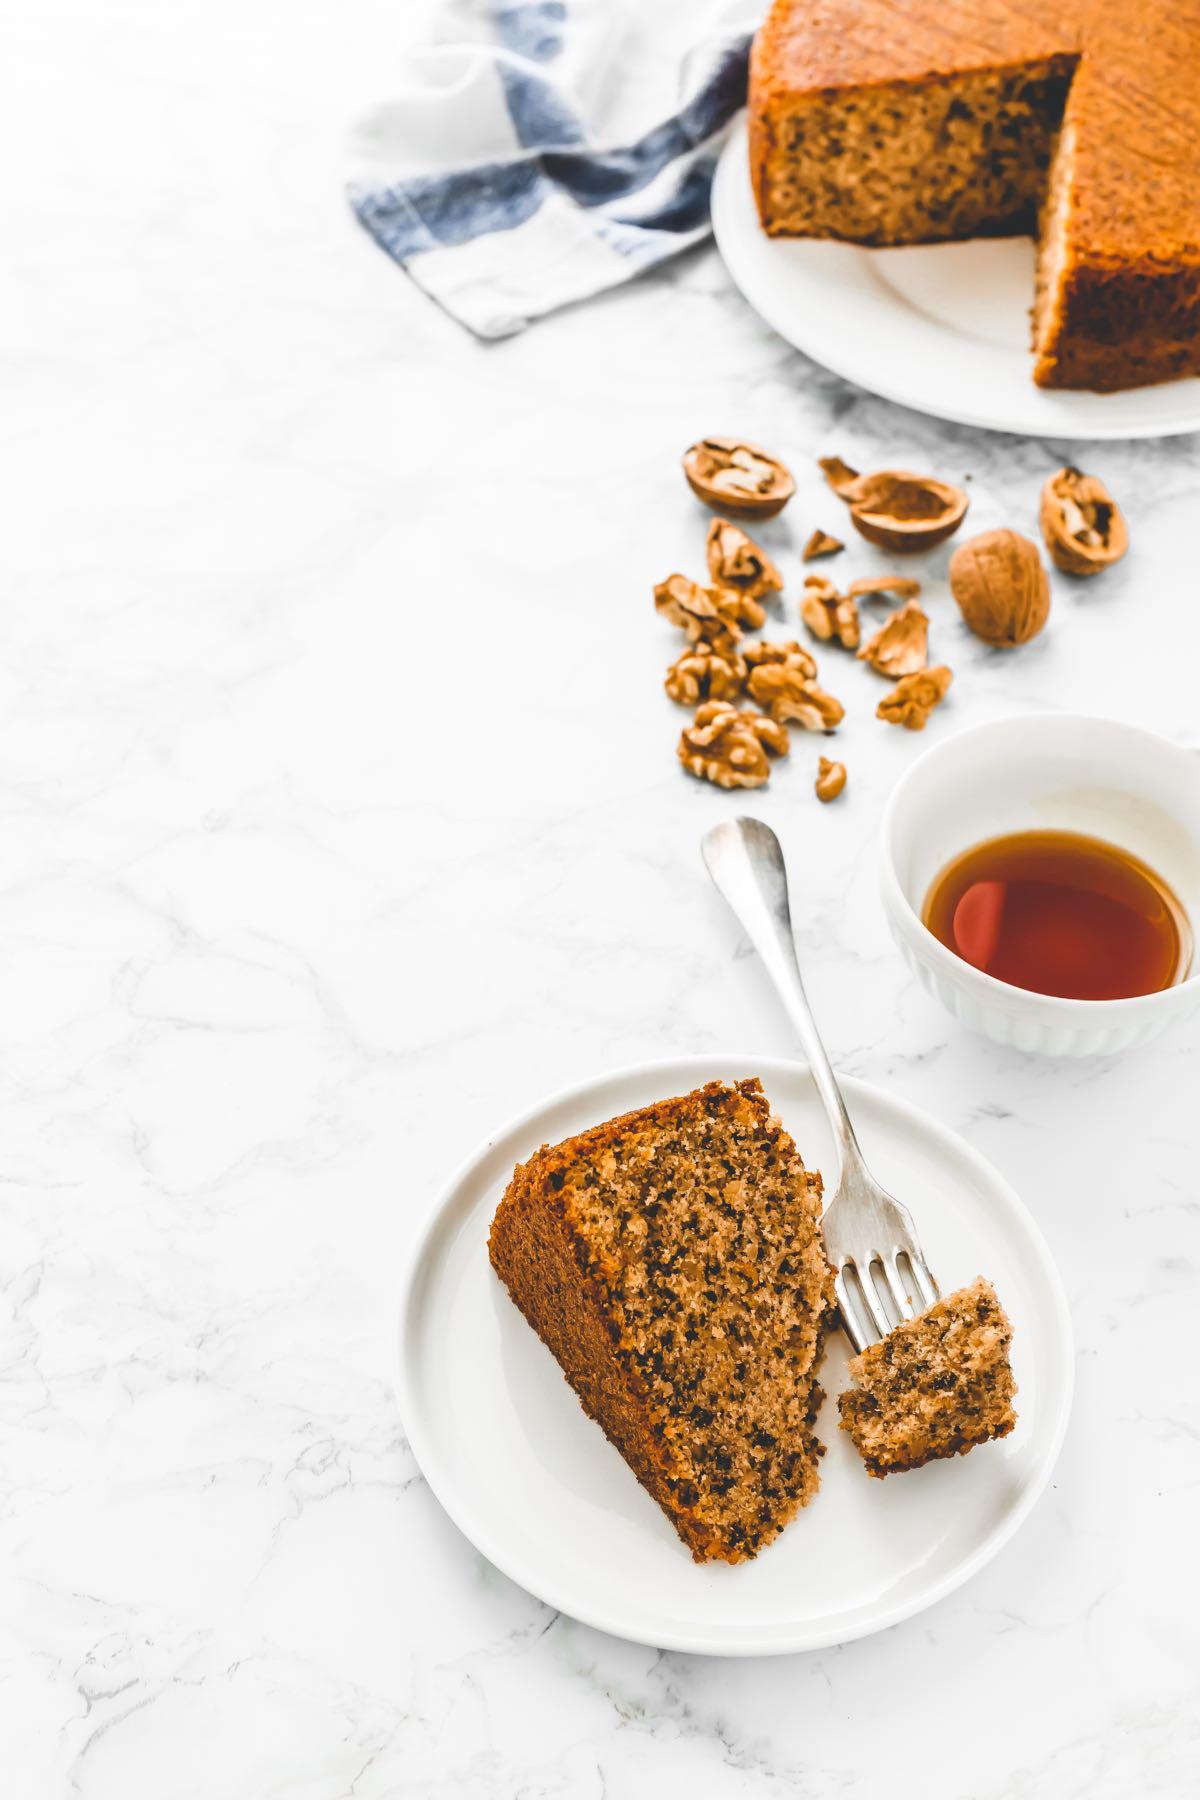 TORTA ALLE NOCI, ricetta facile e veloce - TORTA ALLE NOCI E ARANCE - WALNUT AND ORANGE CAKE - WALNUT CAKE RECIPE